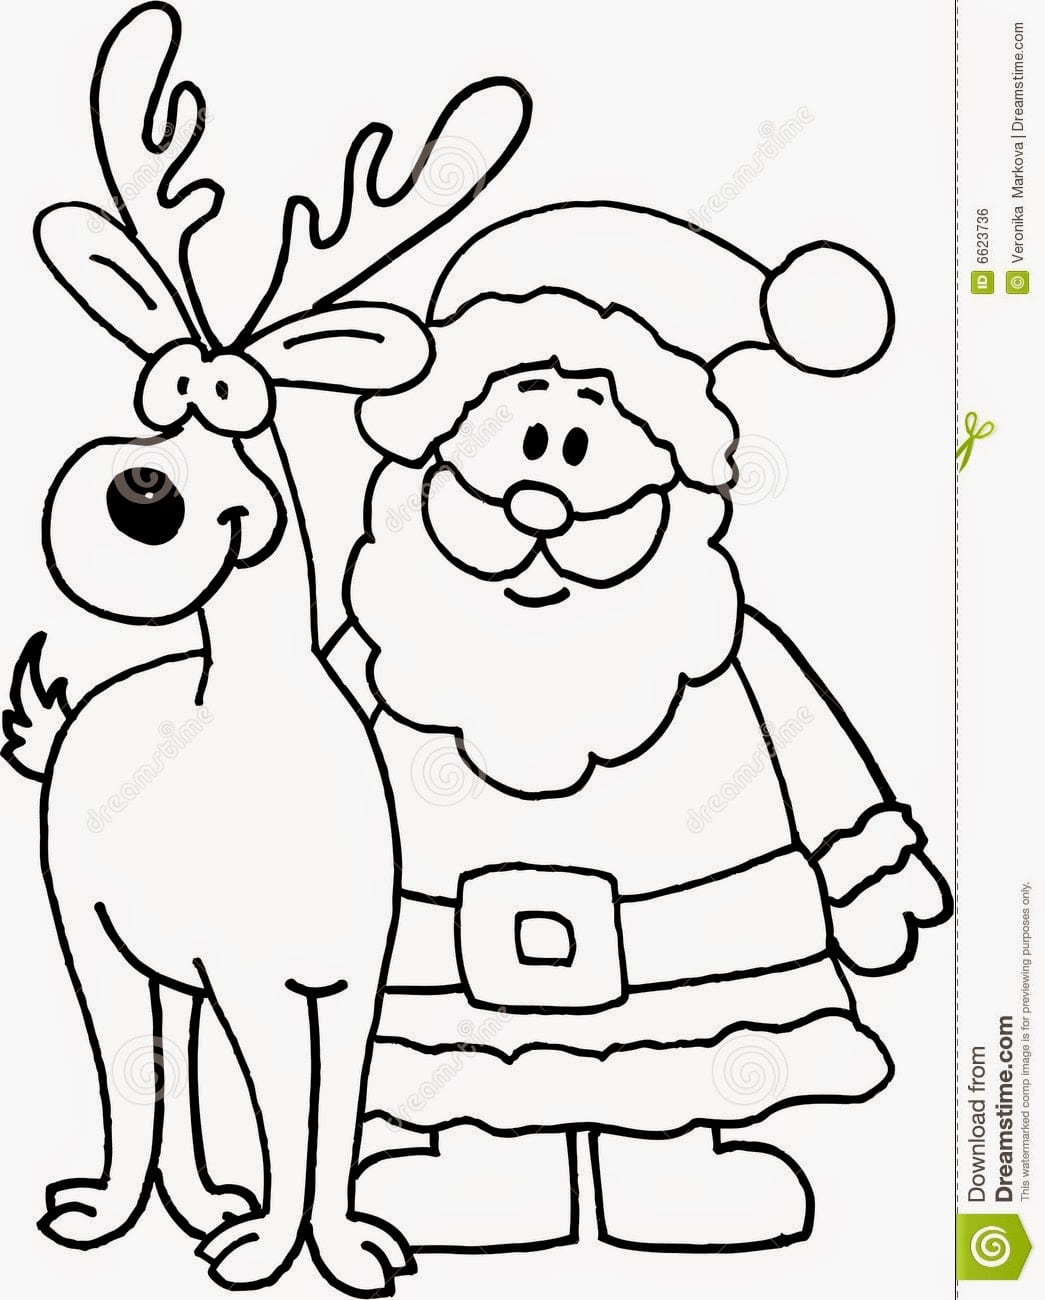 Aprende Brincando 12 Imagens Do Pai Natal (papai Noel) Para